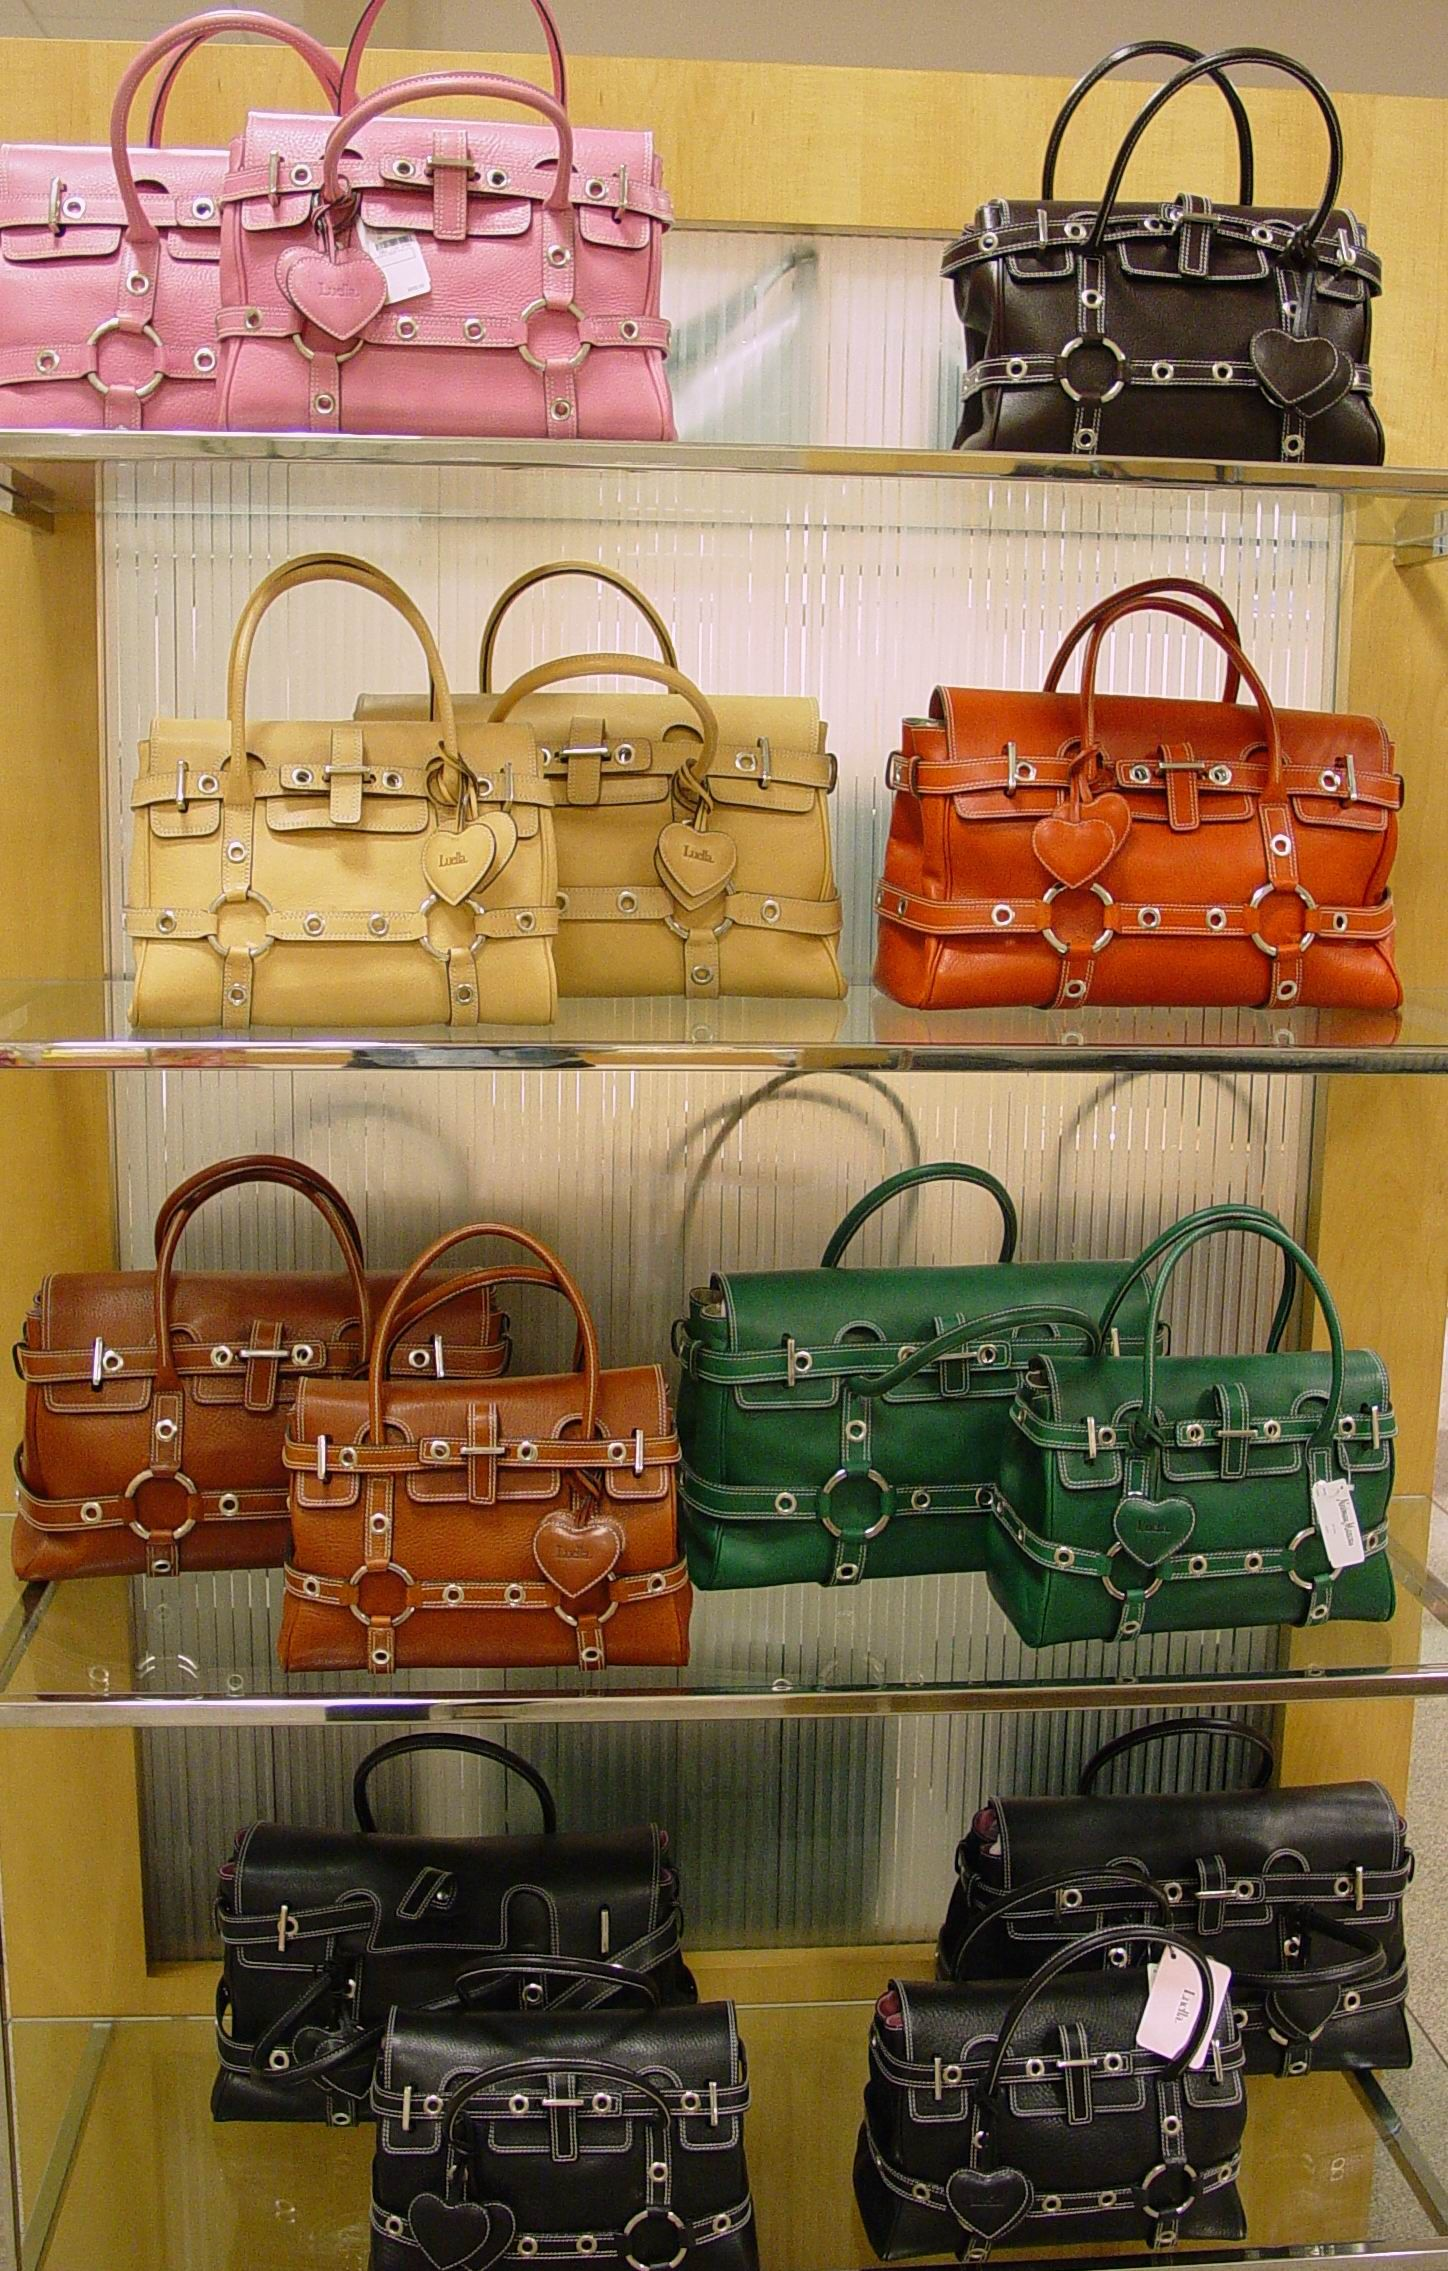 acd4762e71 Luella Giselle Bags: Luella Bartley is a British fashion designer. In 2002,  the